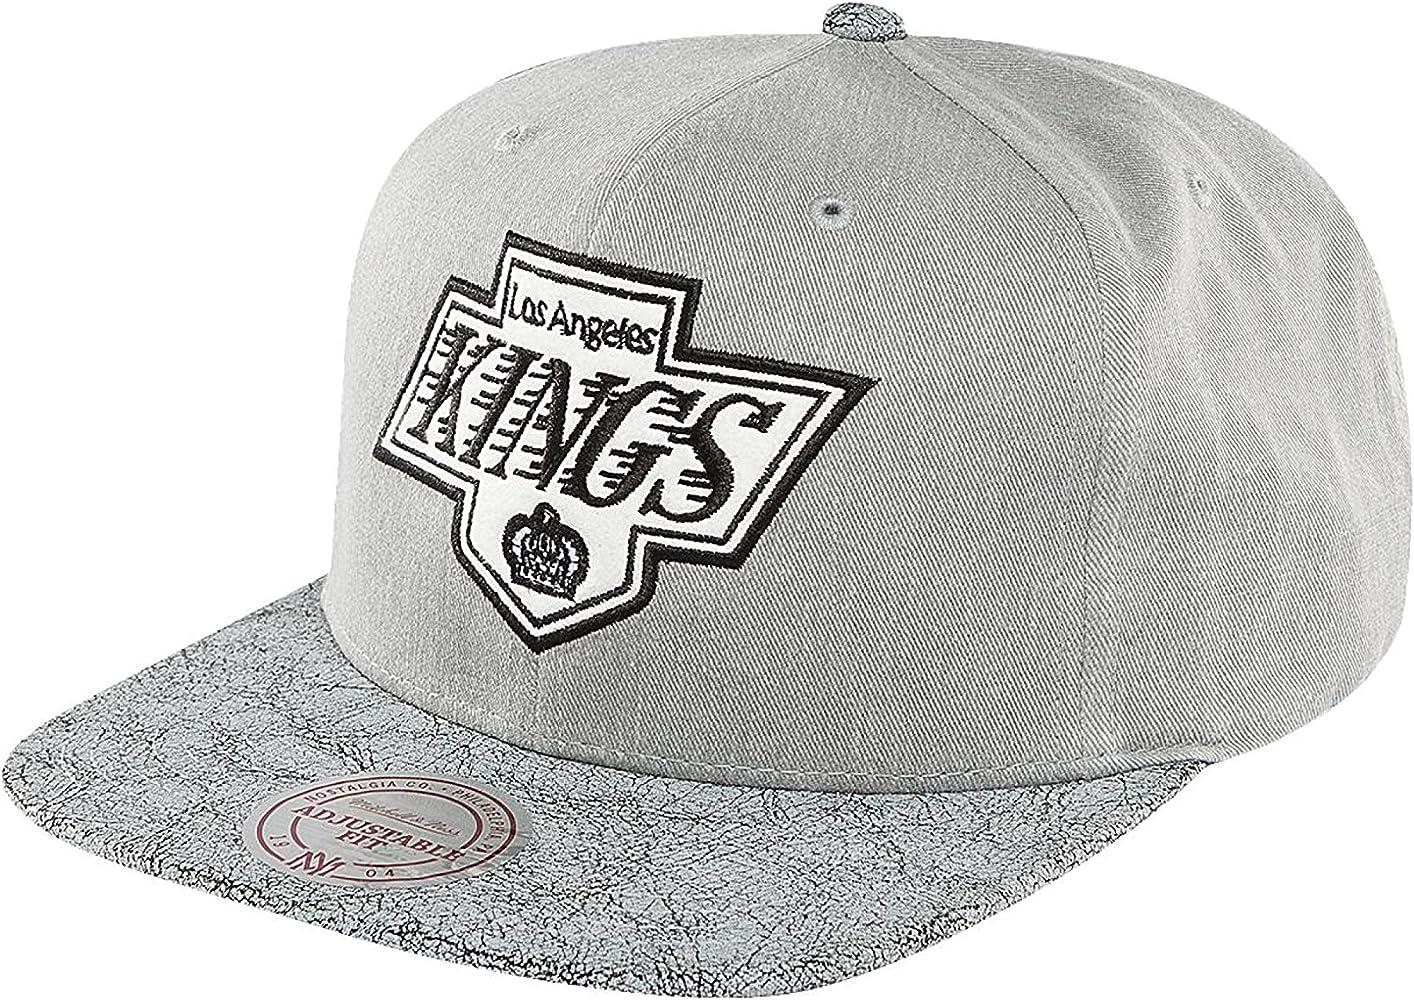 Mitchell & Ness Mujeres Gorras/Gorra Snapback NHL Cracked LA Kings ...